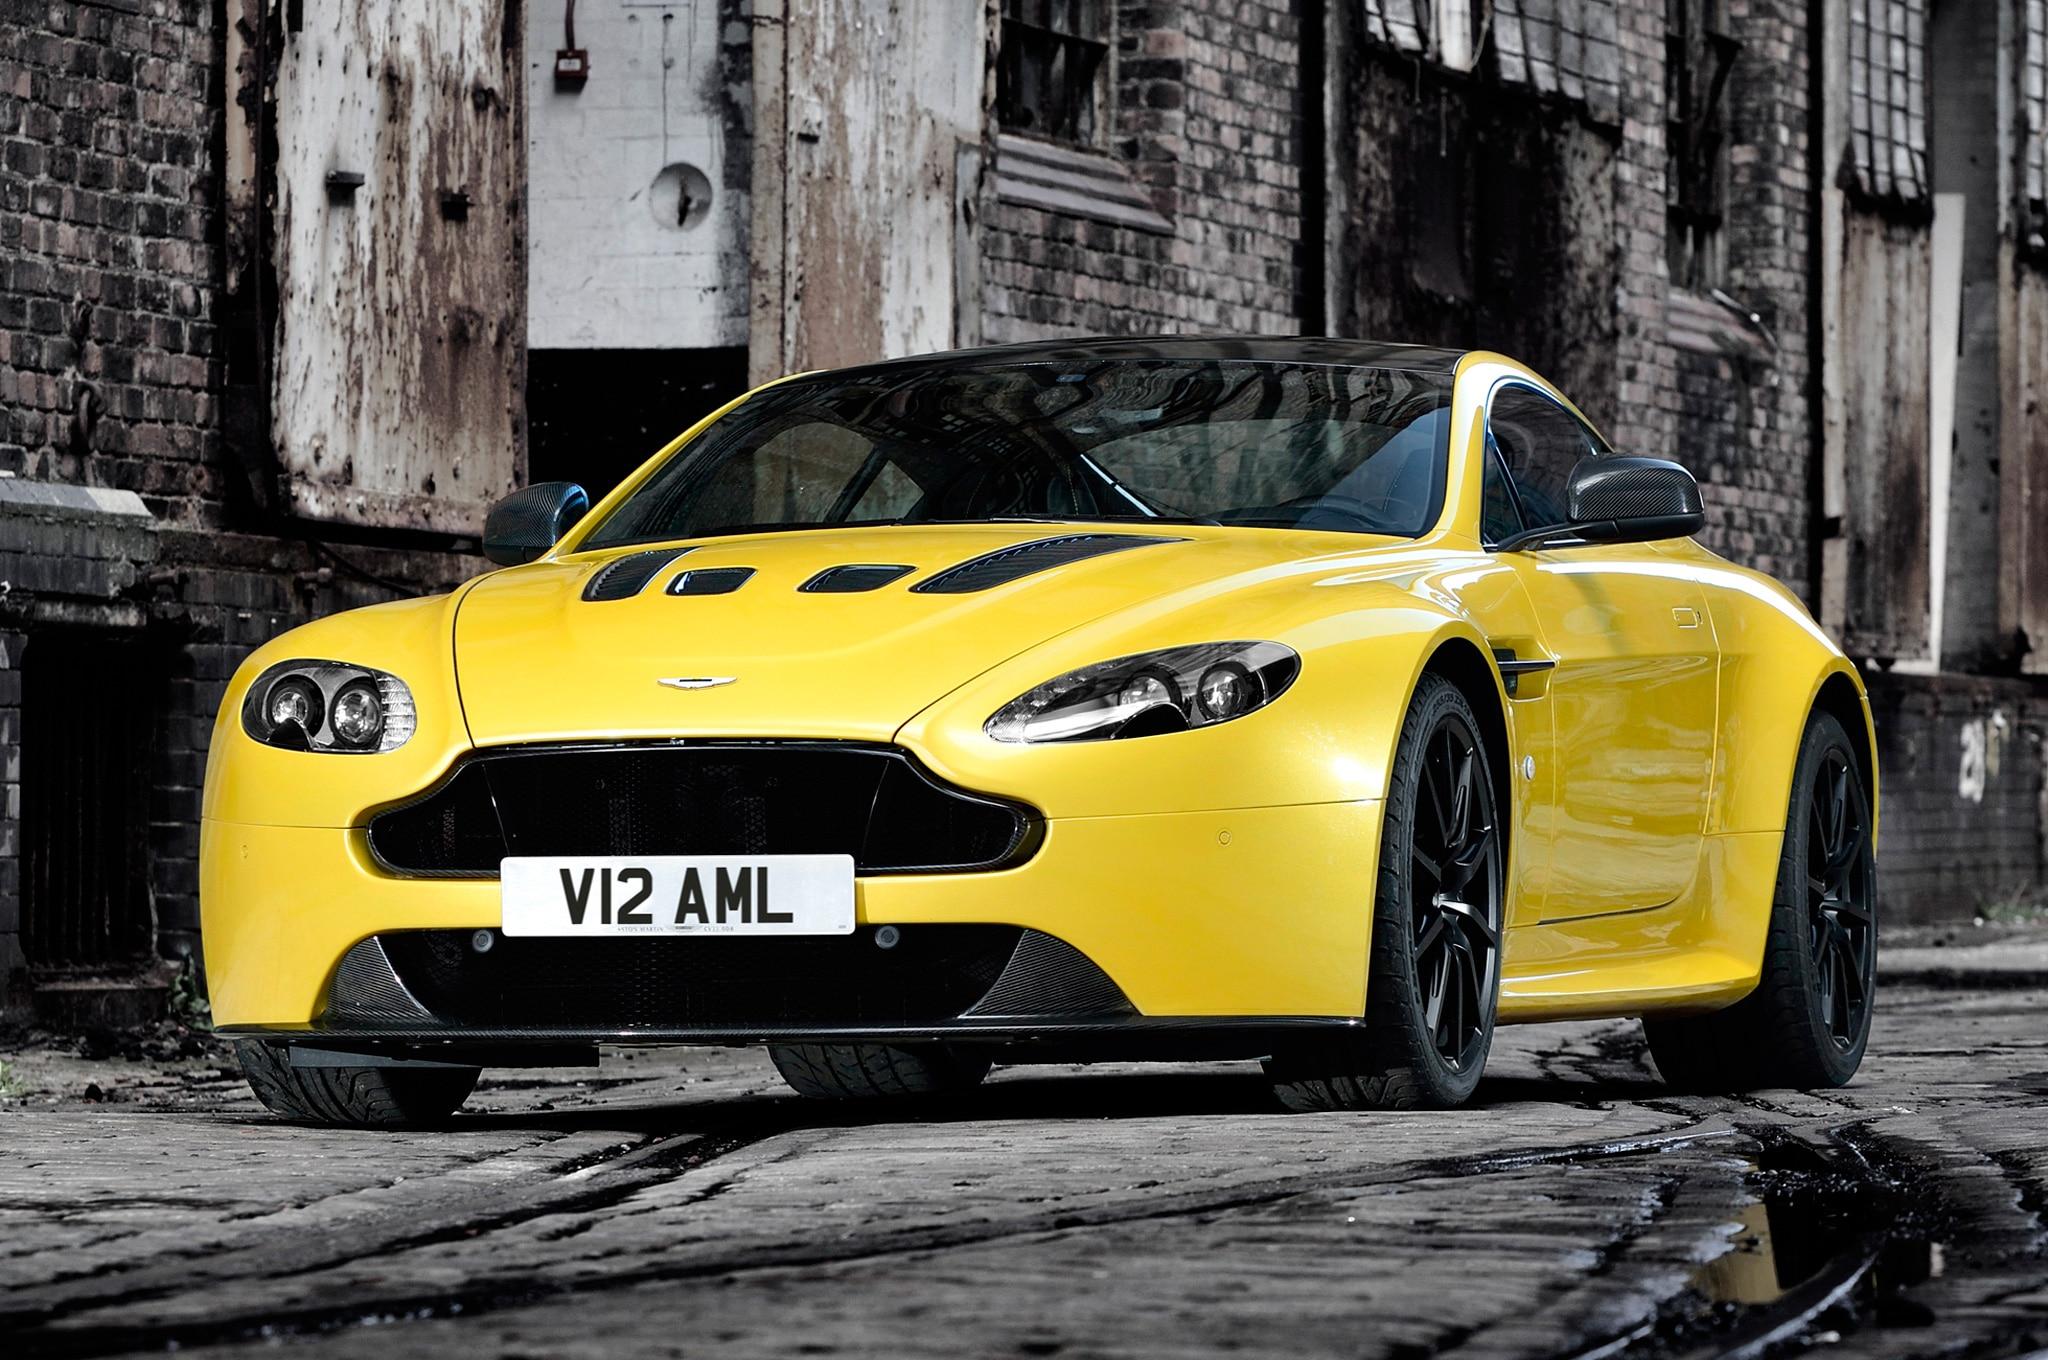 2015 Aston Martin V12 Vantage S Front View On Street1